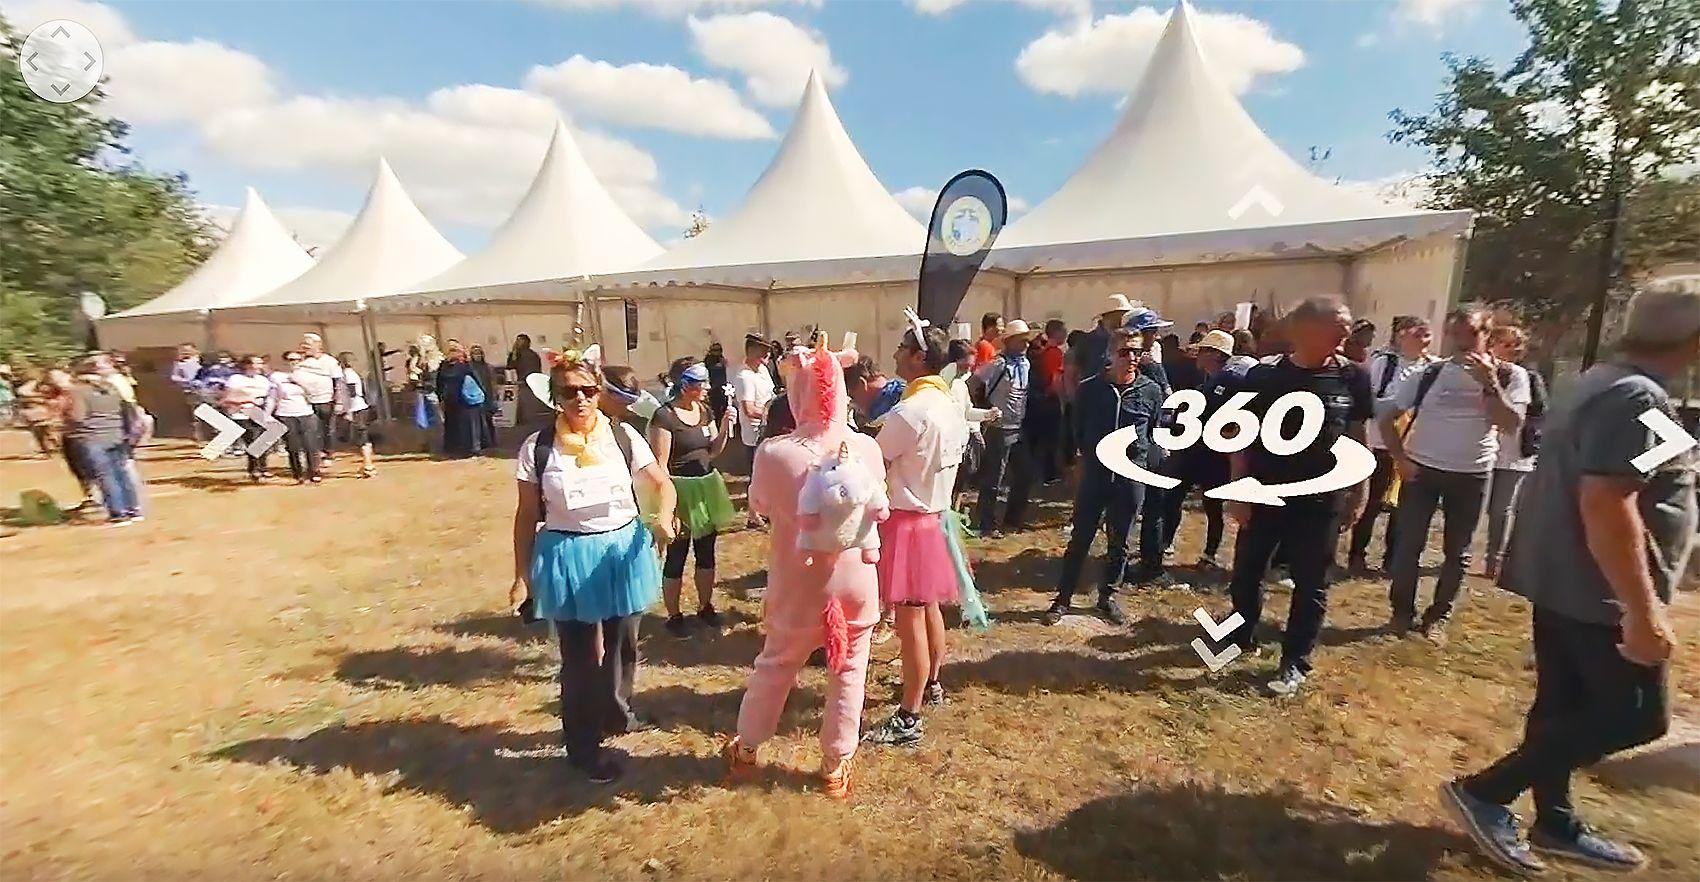 Produit en Bretagne - Vidéo 360°